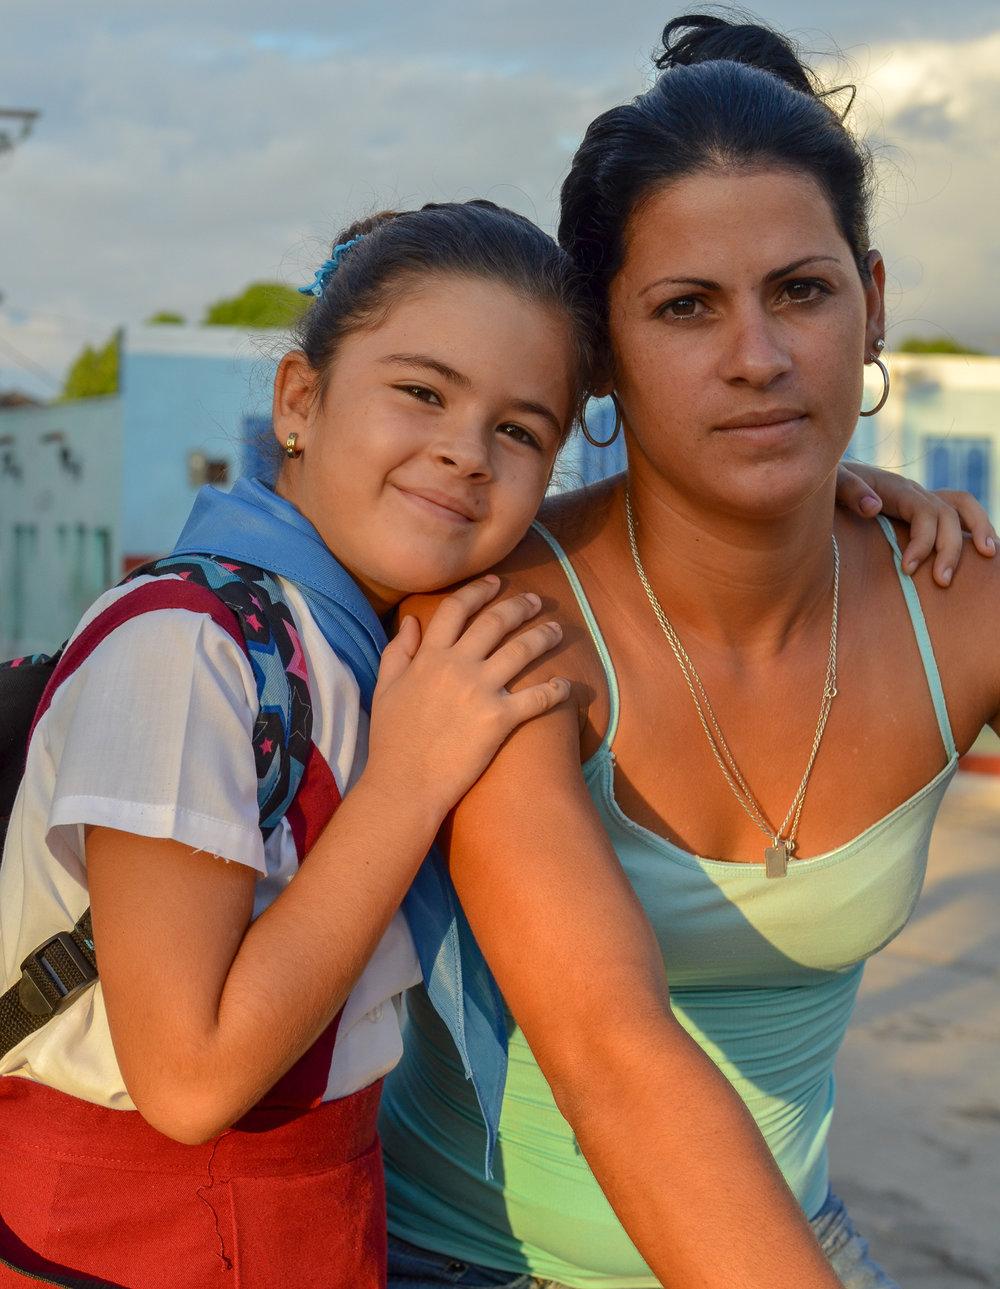 School Girl and Mom Trinidad Cuba 2015.